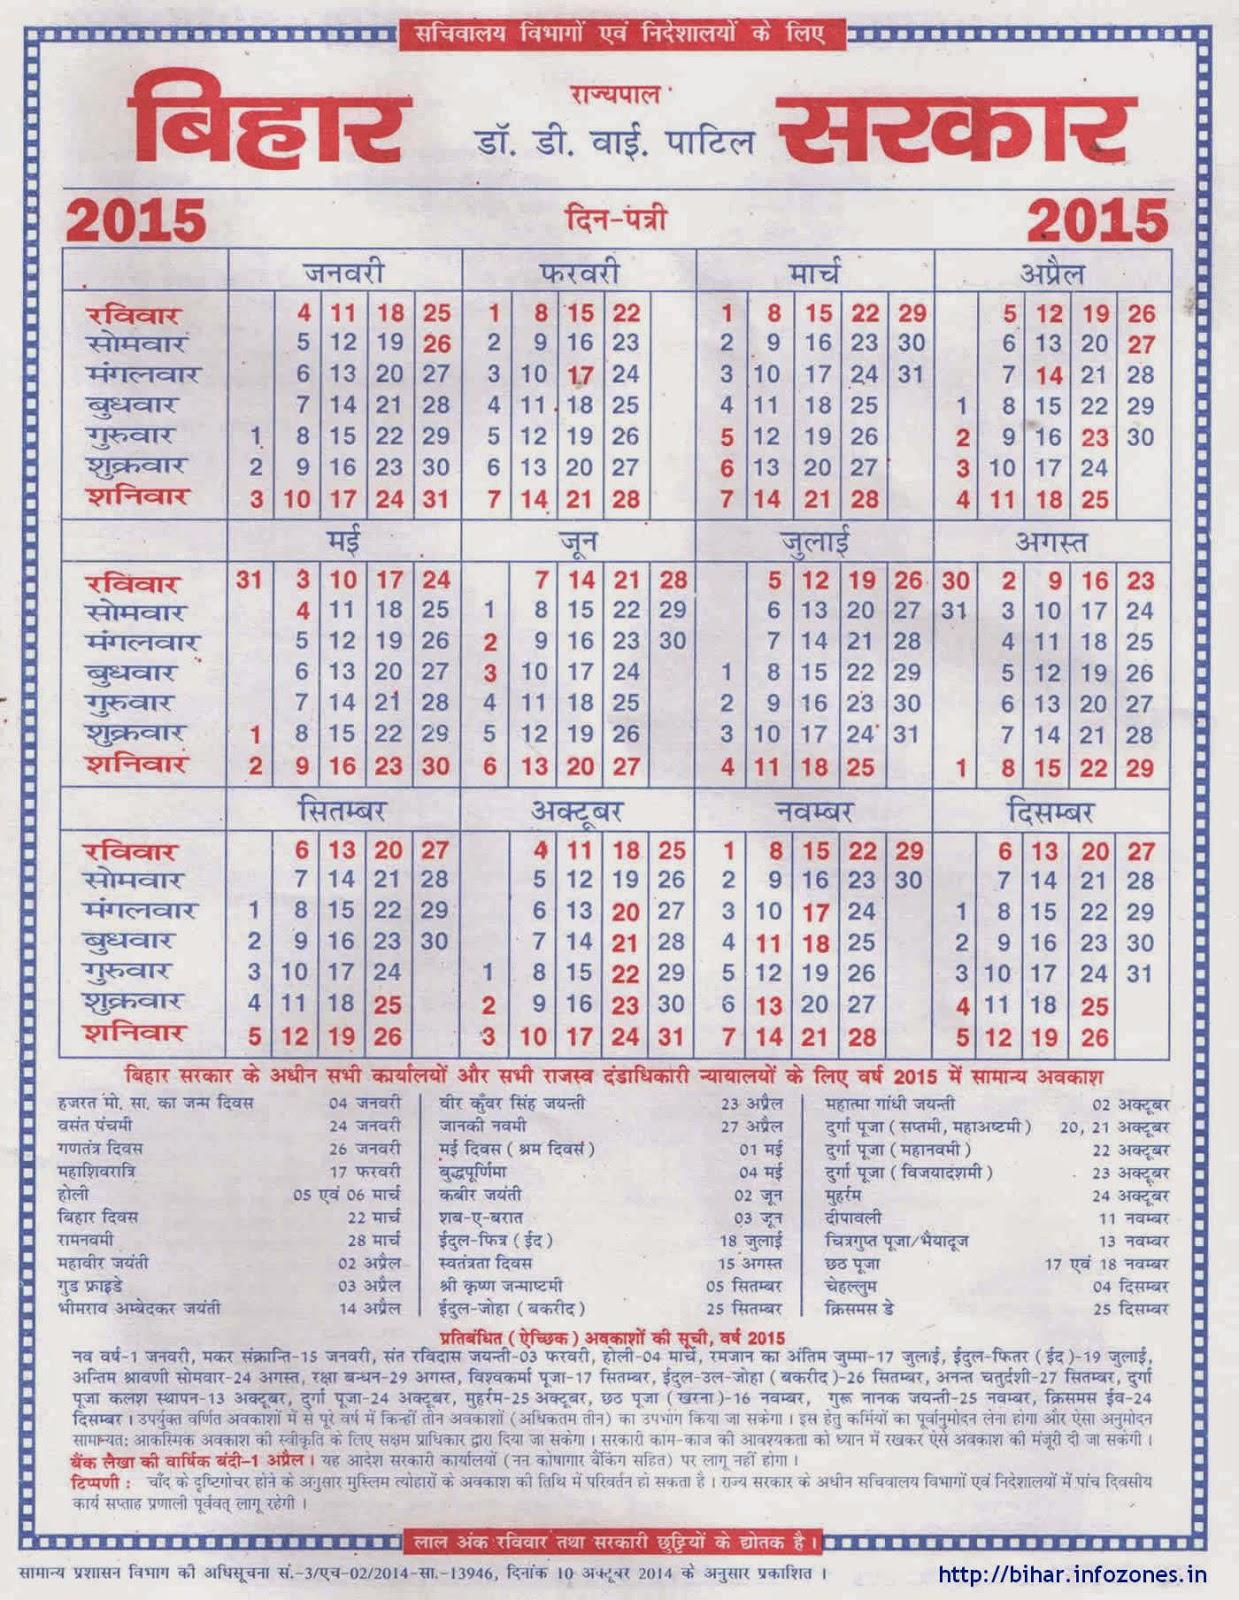 Bihar Government Calendar 2015 within Bihar Government Calander